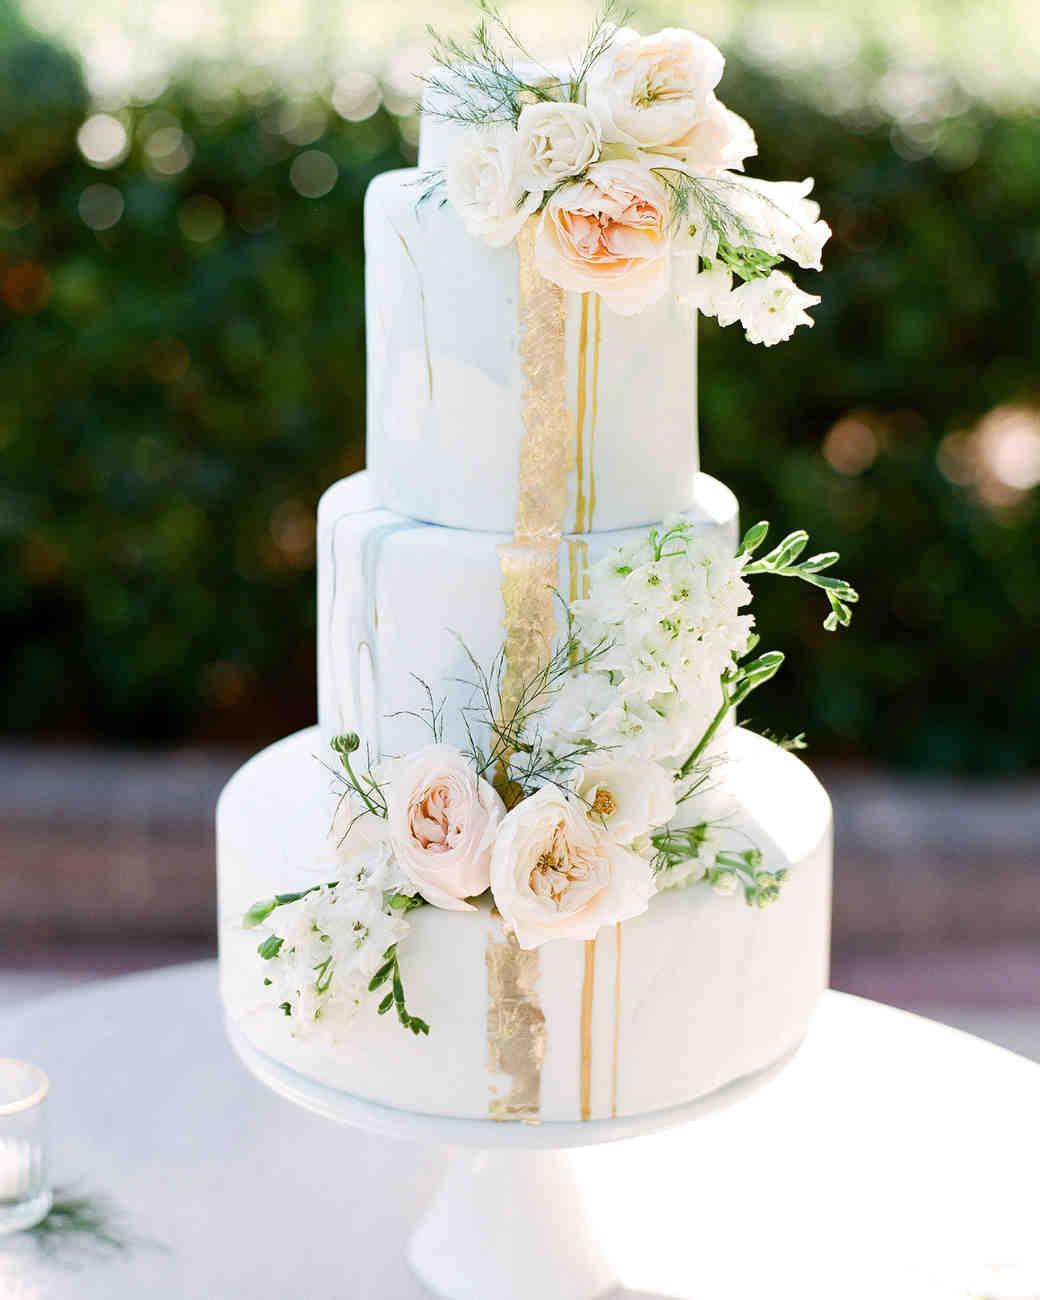 Summer Wedding Cakes  44 Wedding Cakes with Fresh Flowers